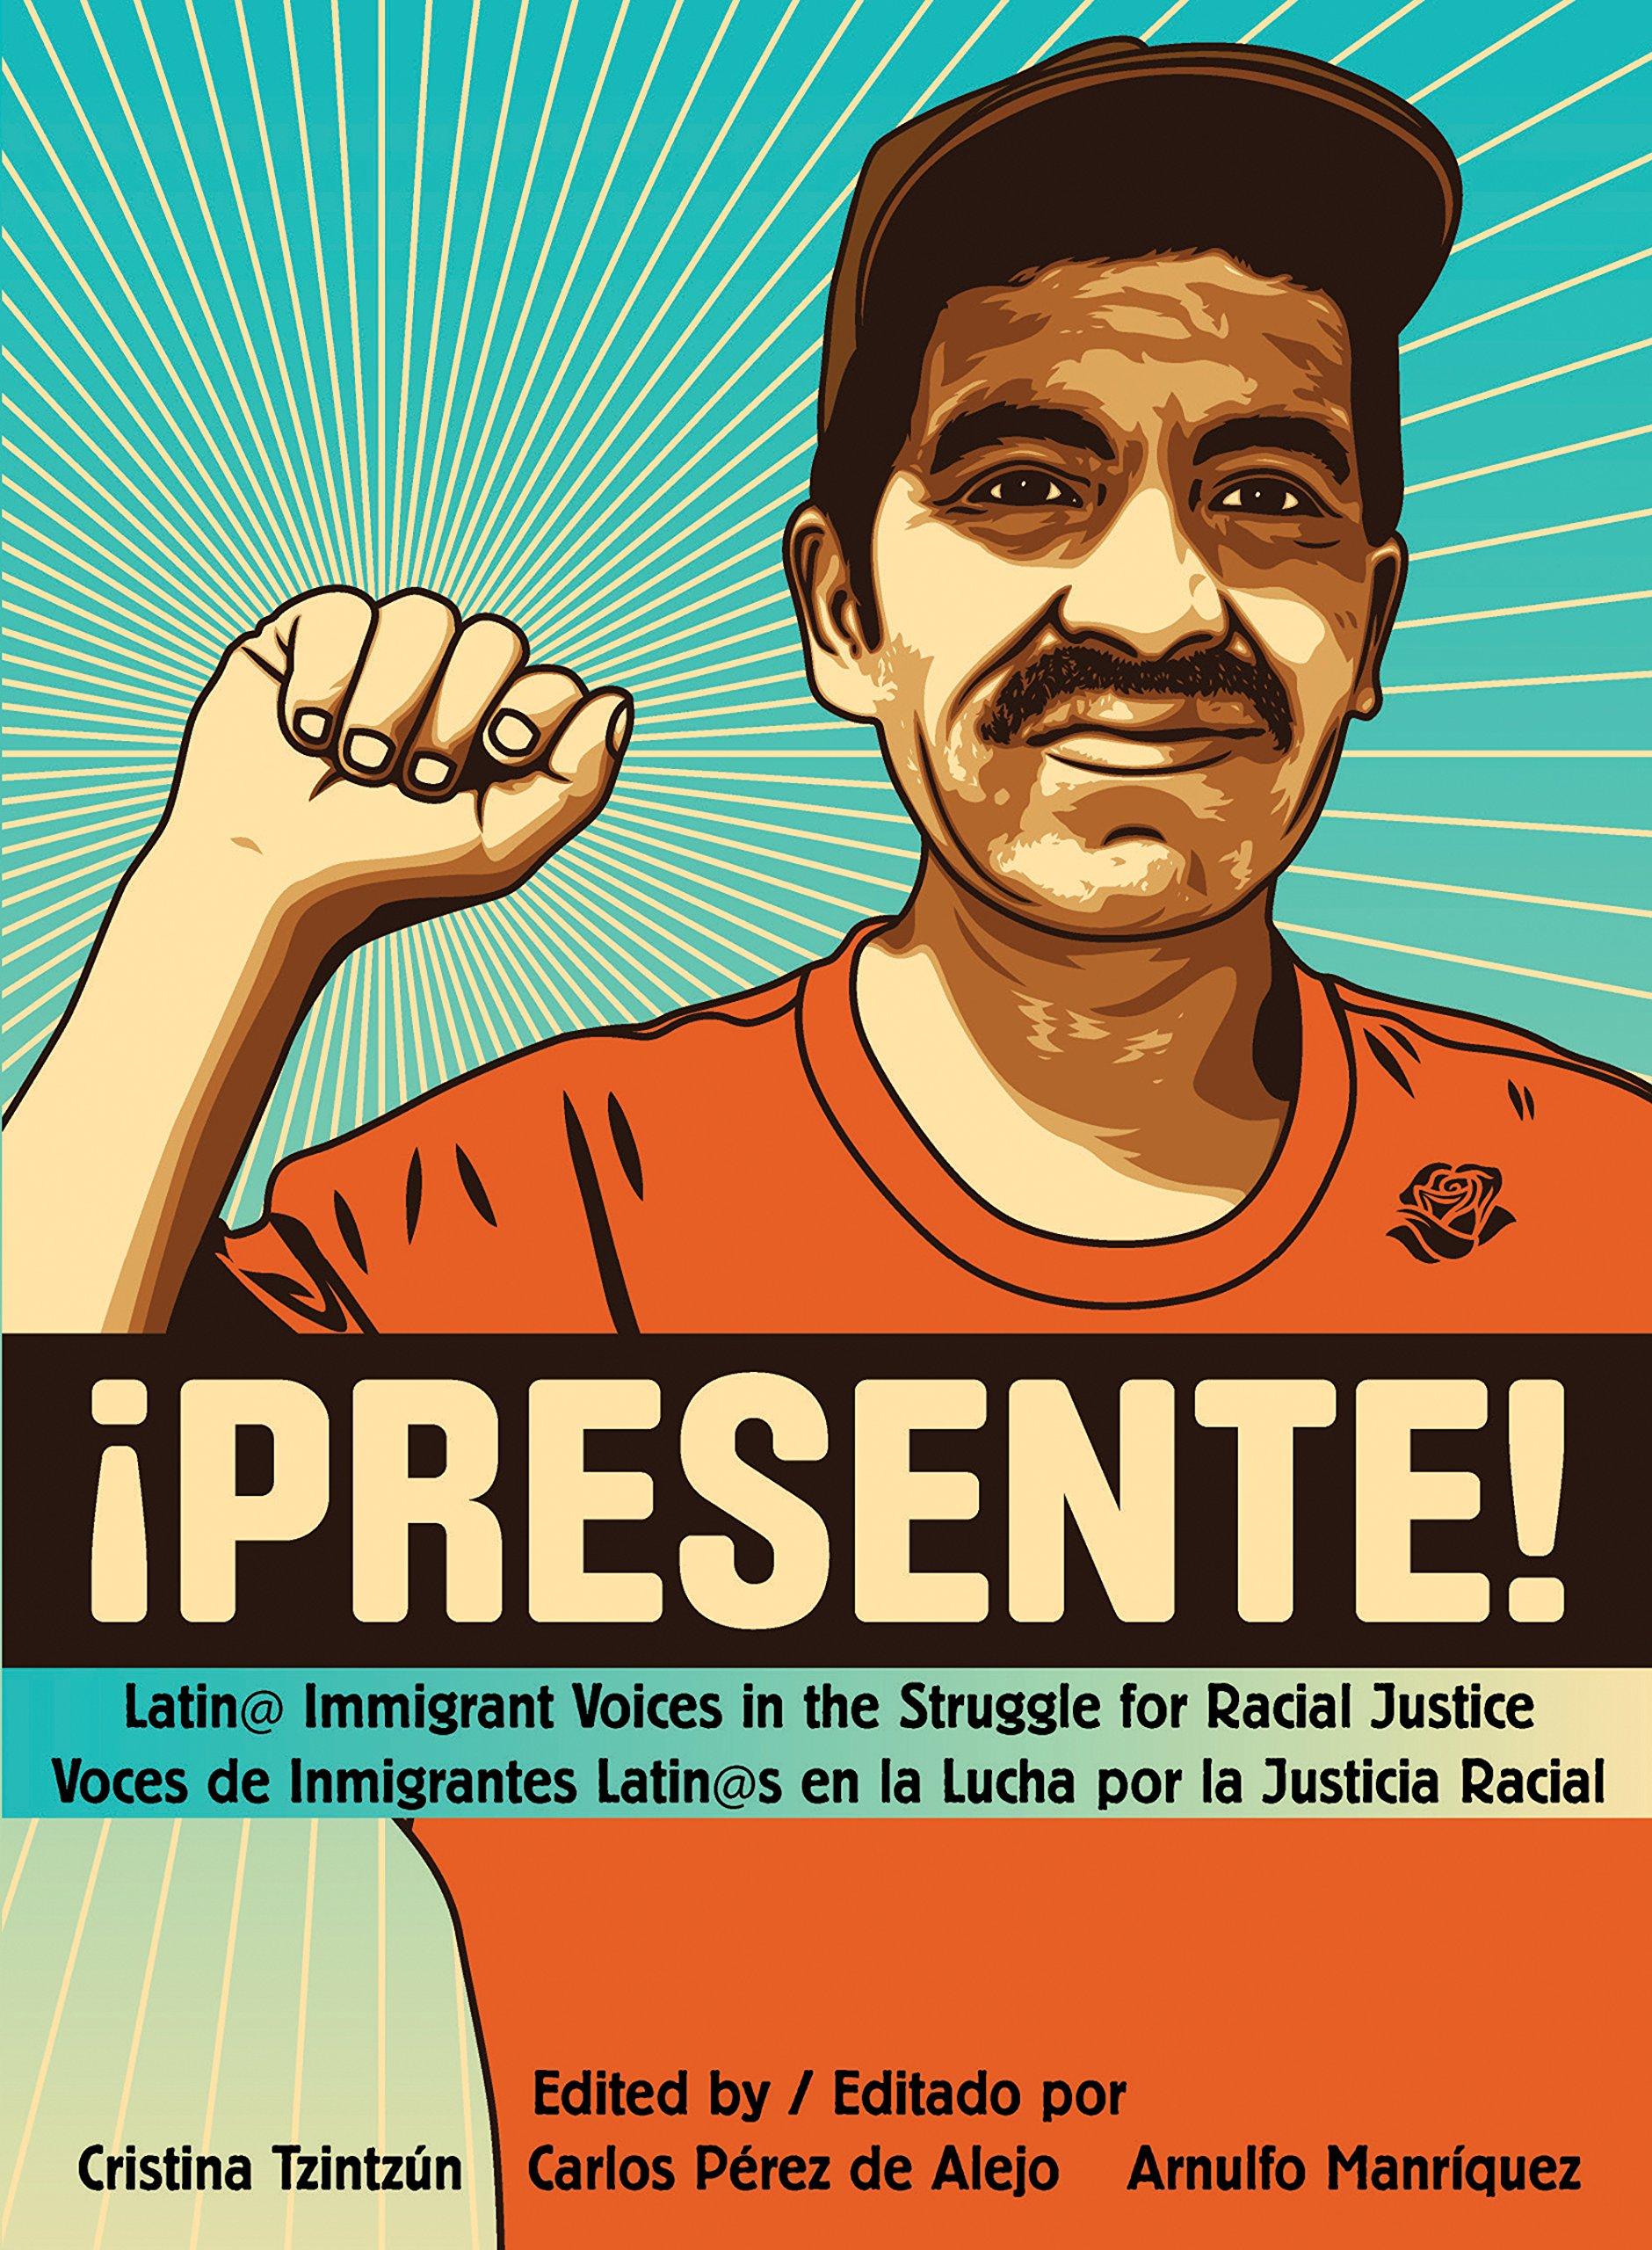 Latin  Immigrant Voices in the Struggle for Racial Justice   Voces  Inmigranted Latin s en la Lucha por la Justicia Racial Paperback – May 27 9e65f98c6ab4